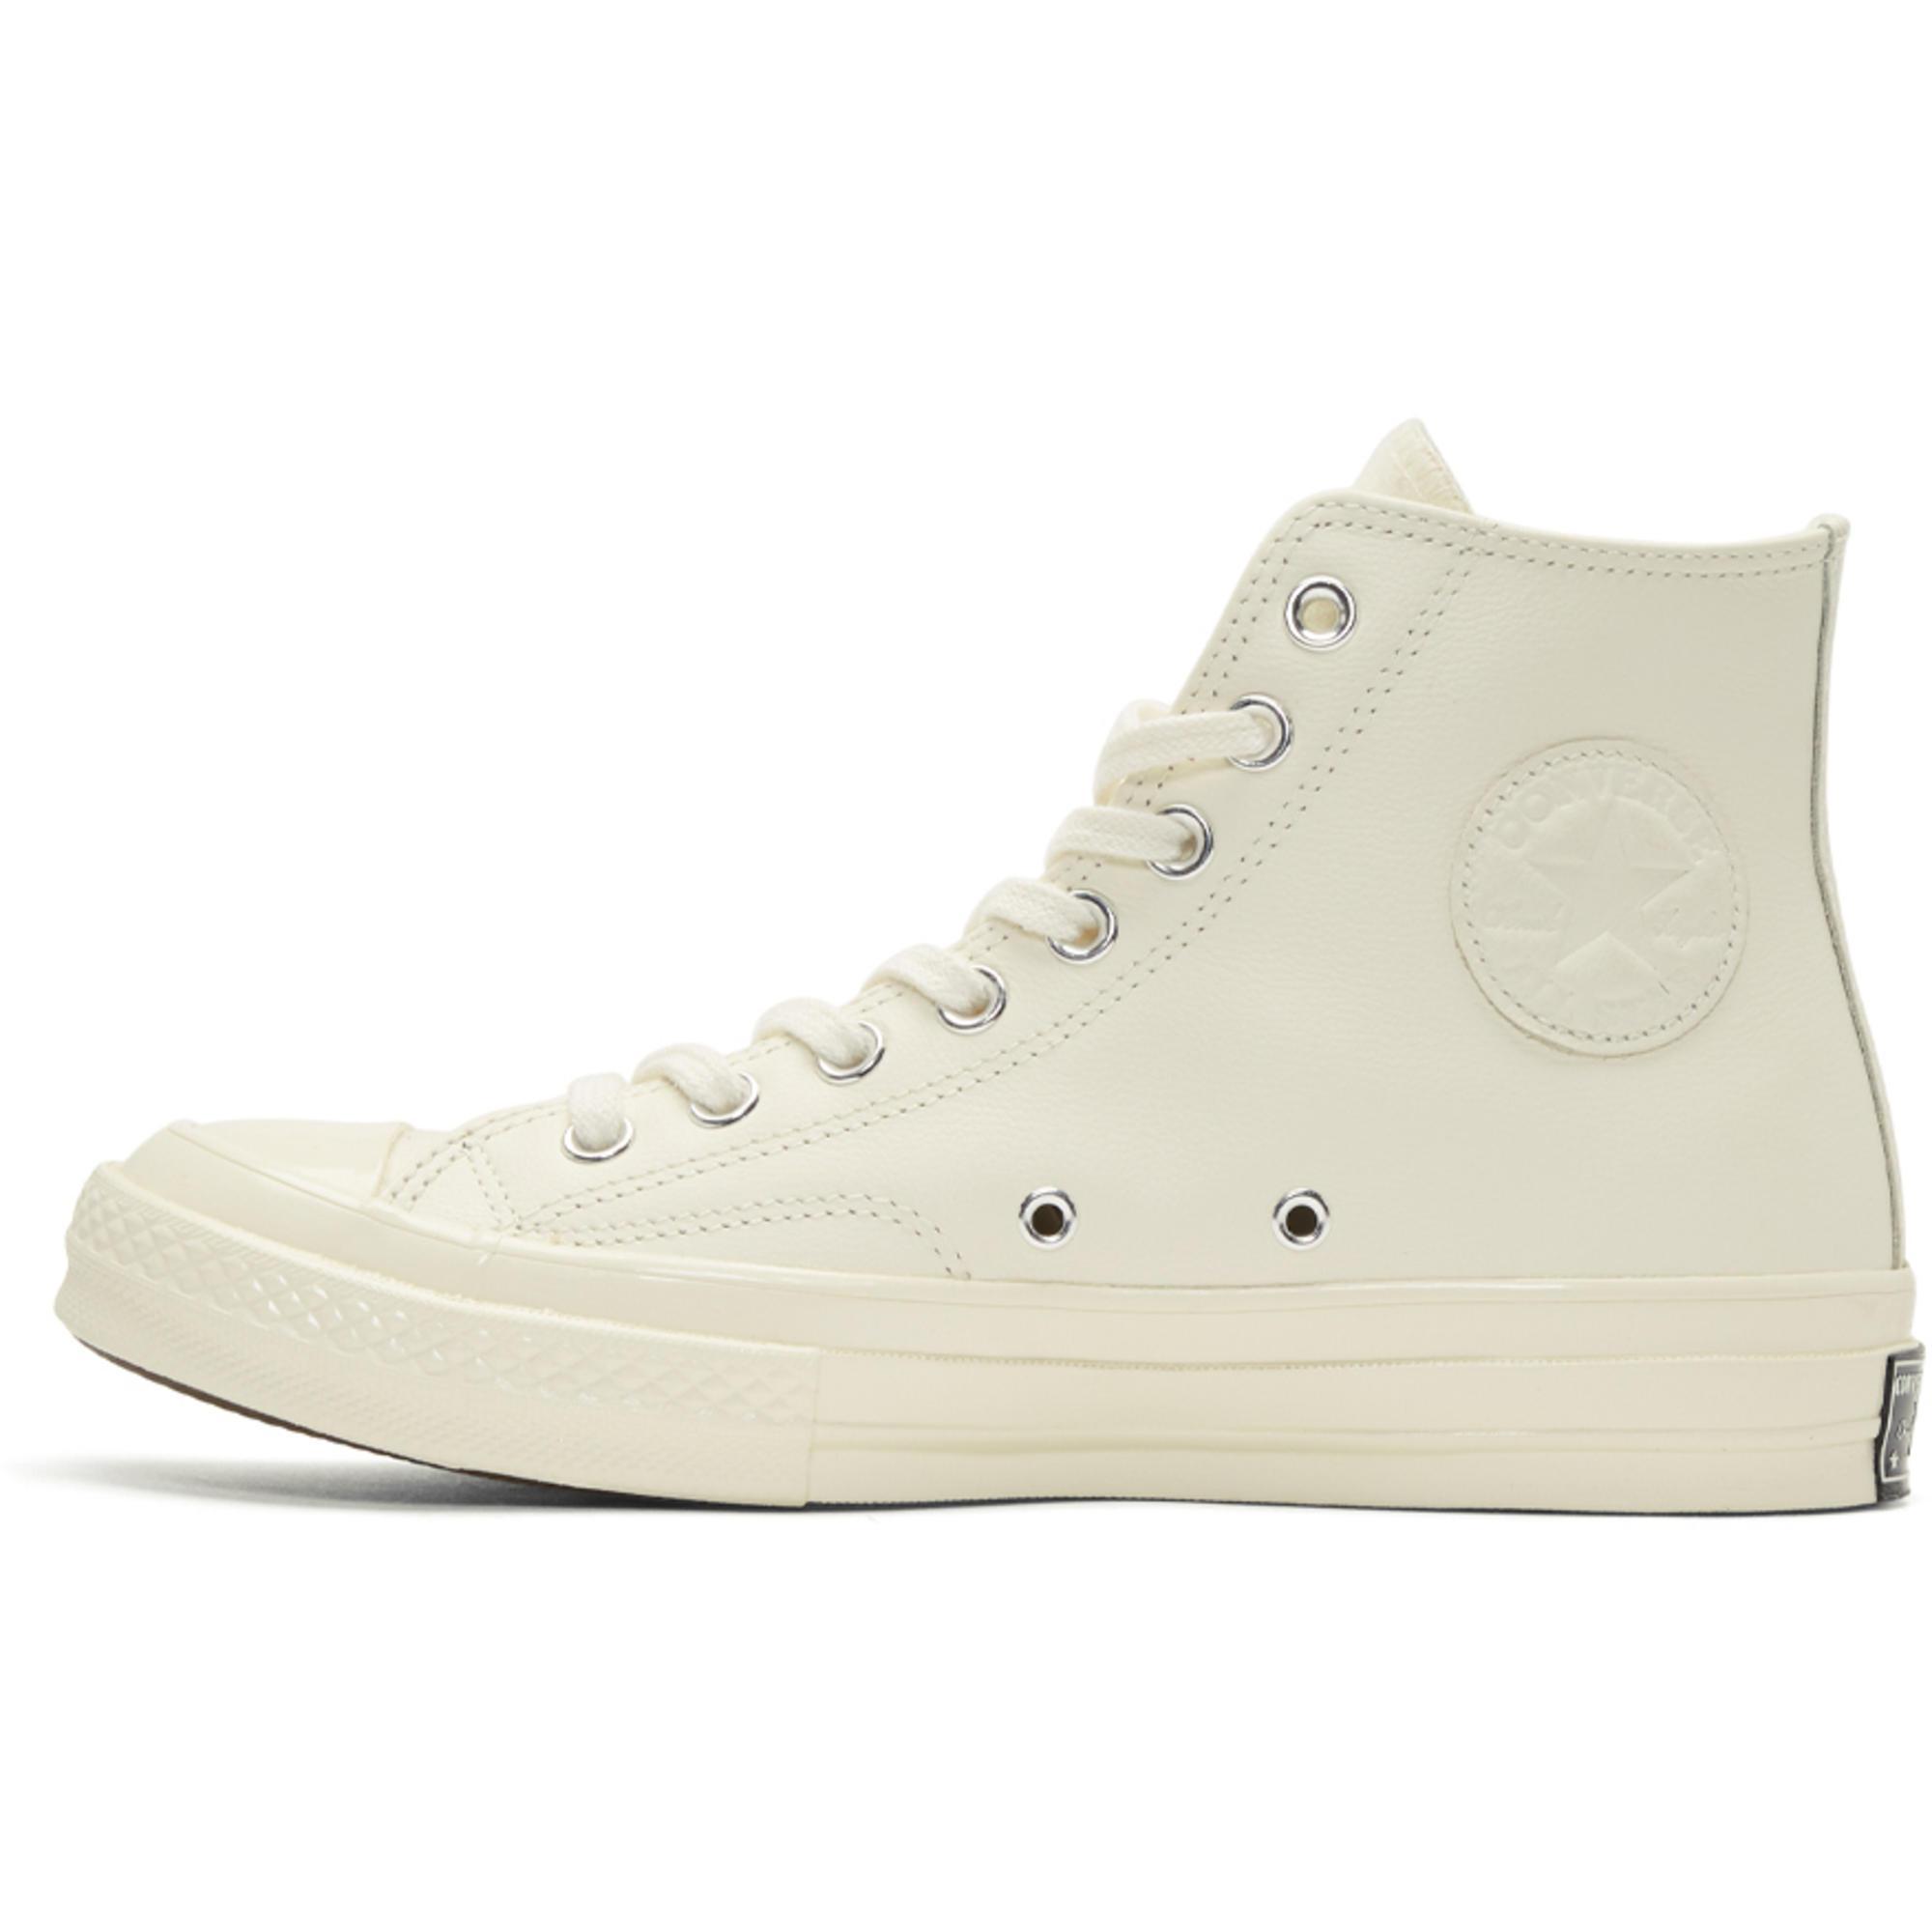 d4b7ea7f0a1d Lyst - Converse White Chuck Taylor All Star 70 Wordmark Wool High ...